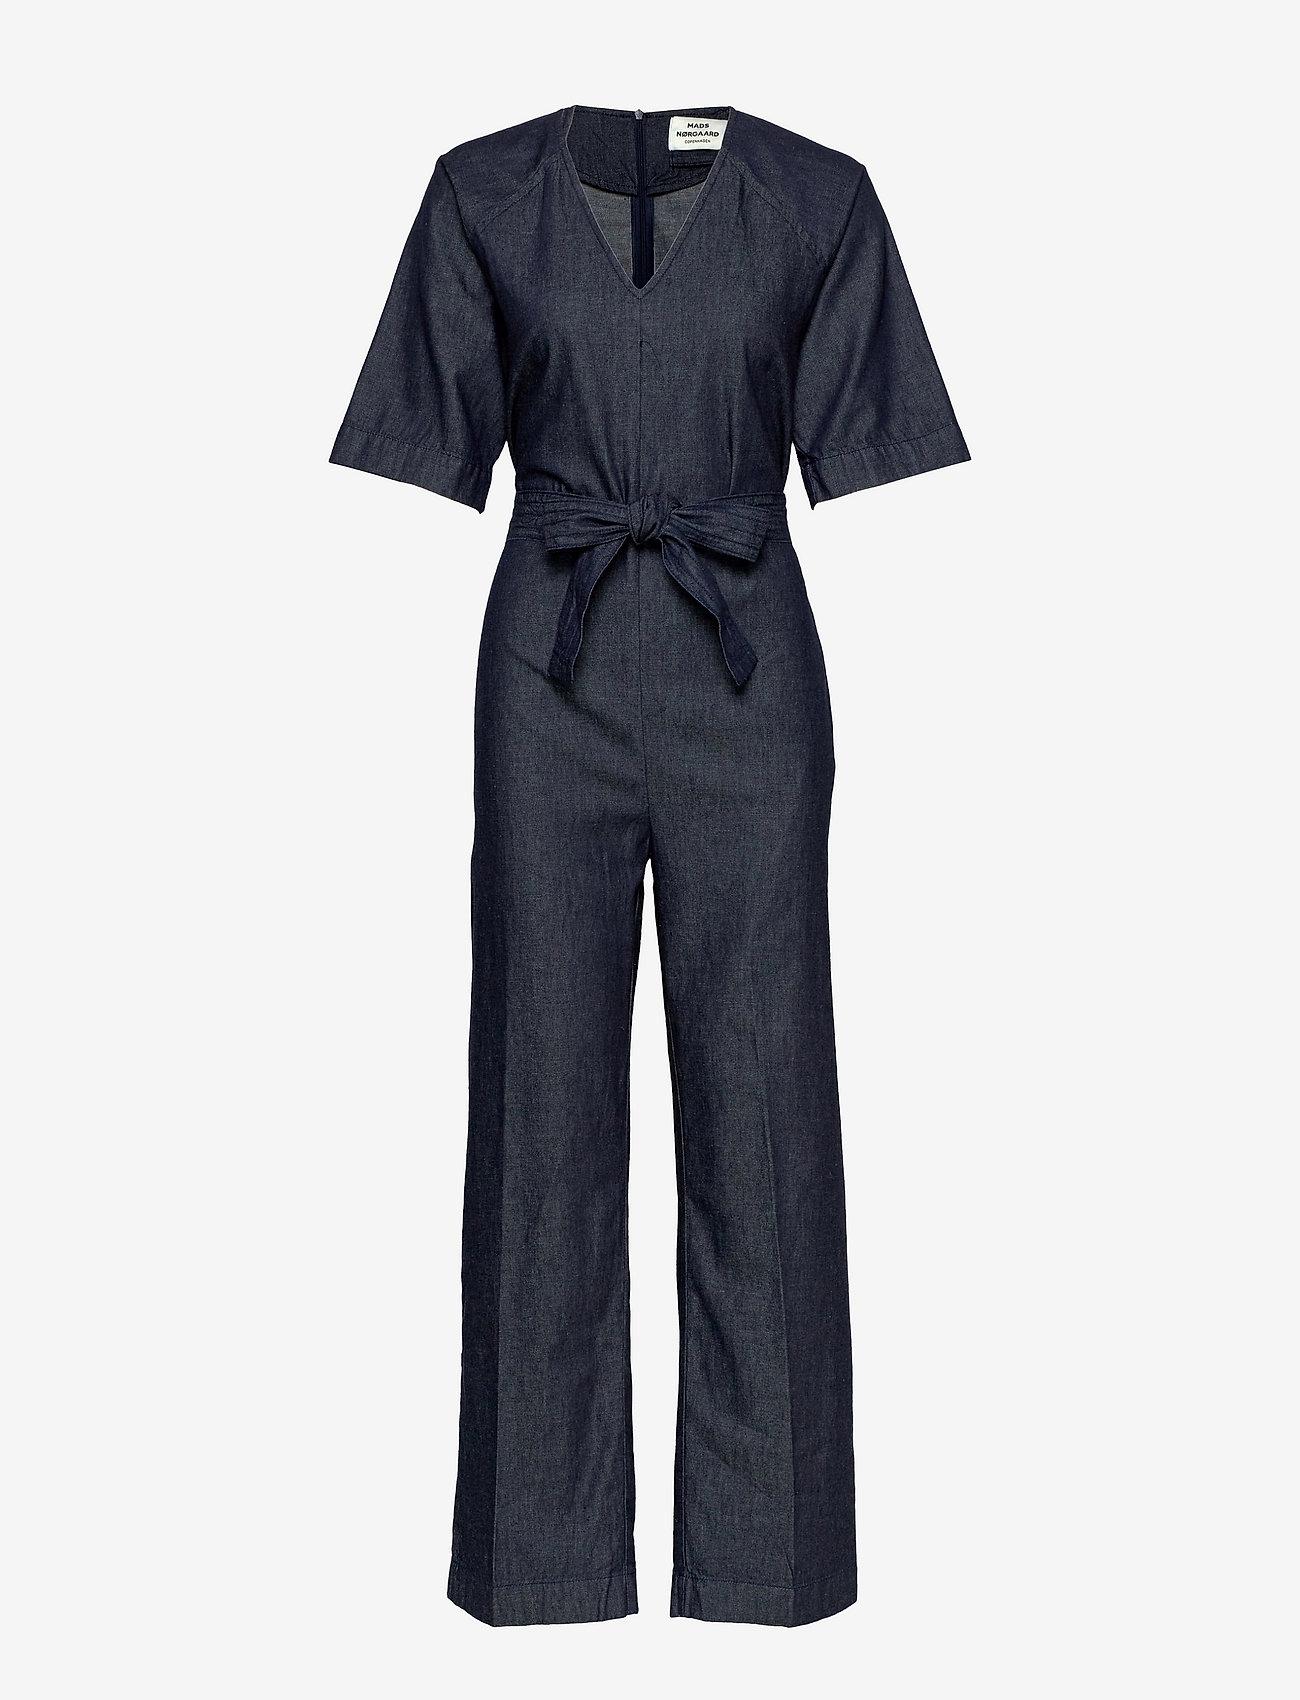 Mads Nørgaard - Fall Indigo Jilda - clothing - unwashed - 0